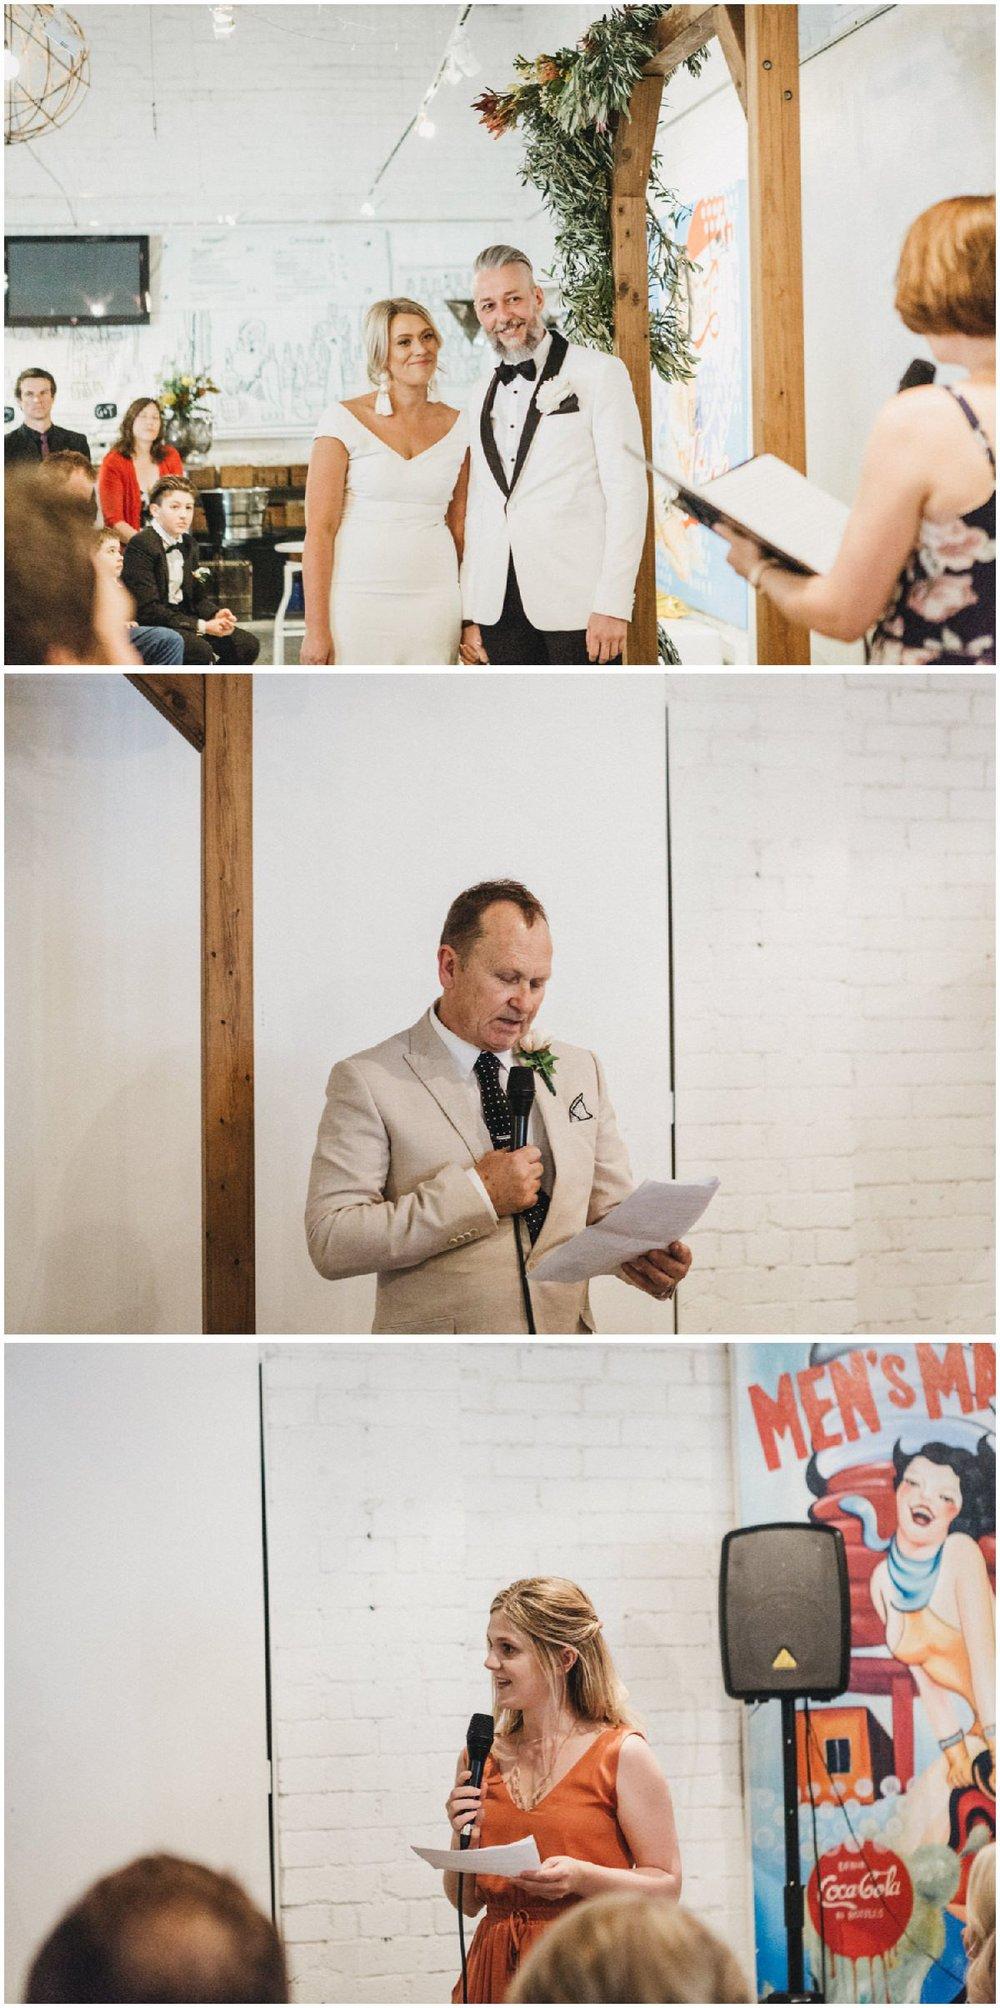 Emily_Tim_Melbourne_Beach_city_wedding_095.jpg